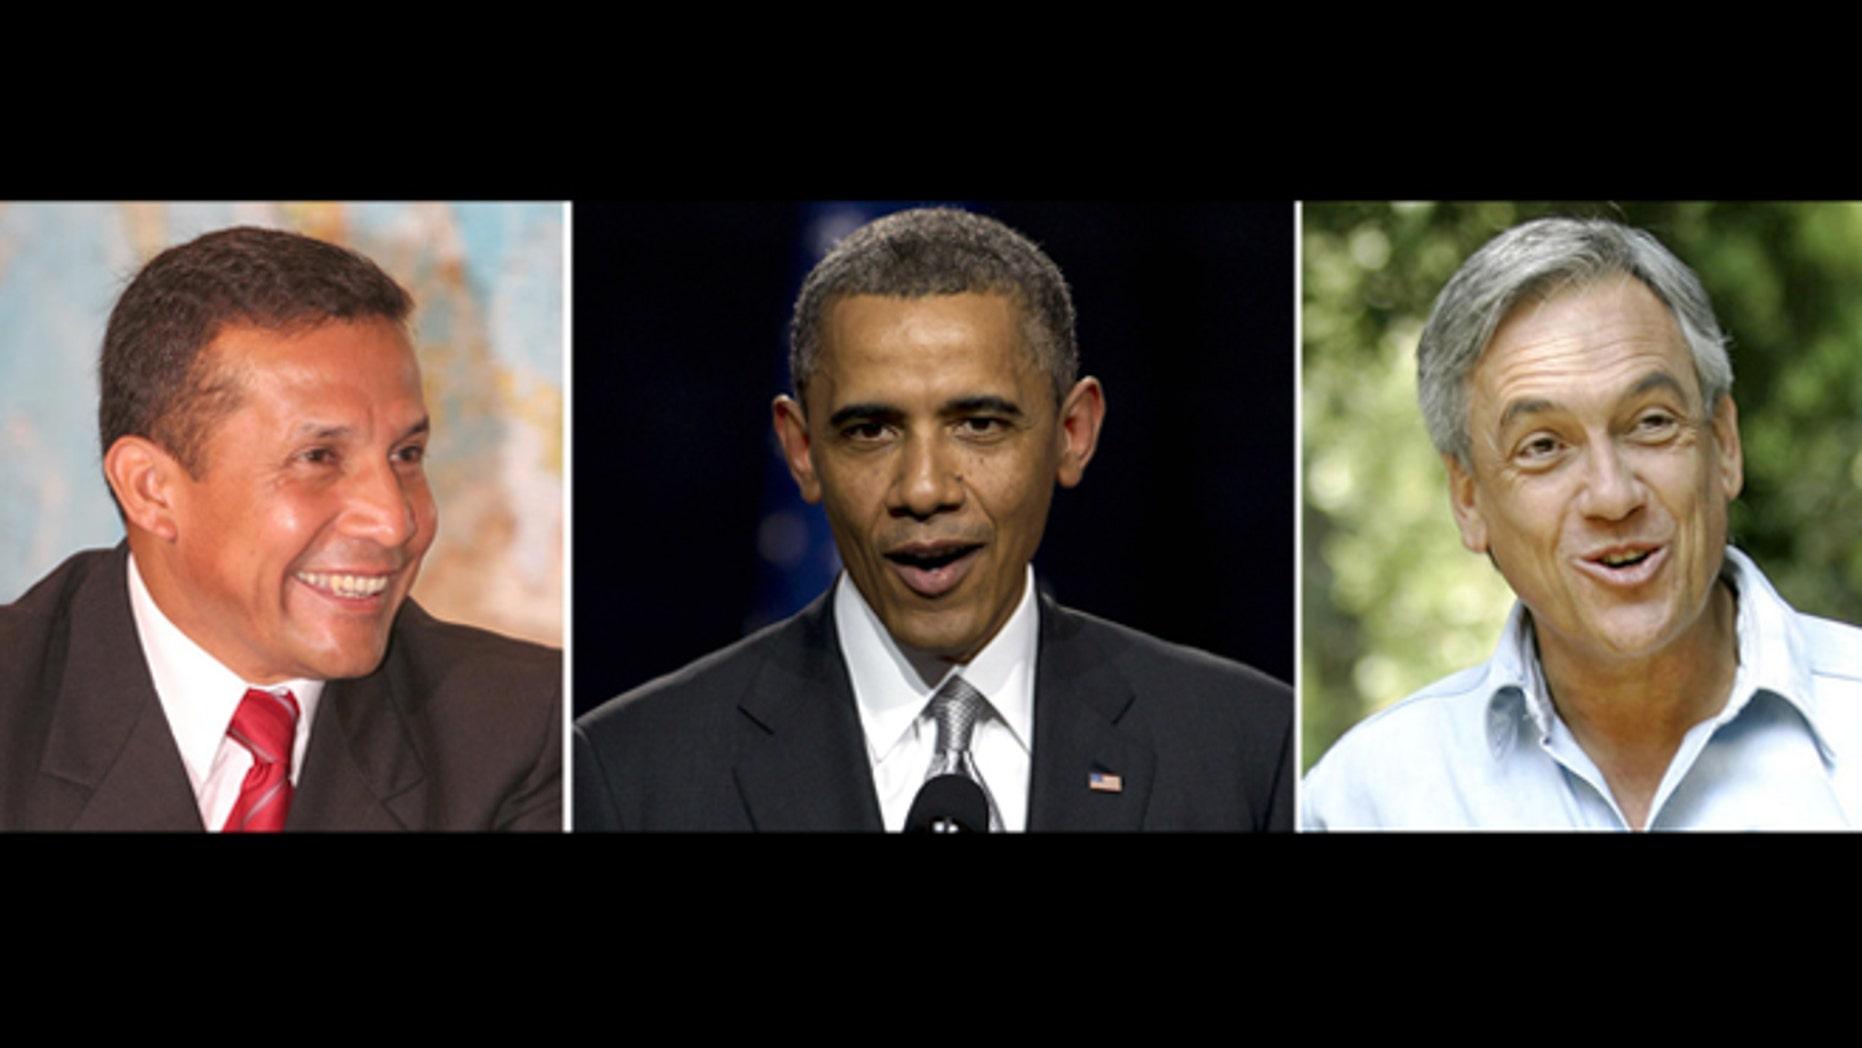 This is a photo composite of Peruvian President Ollanta Humala (left, U.S. President Barack Obama (center) and Chilean President Sebastián Piñera.